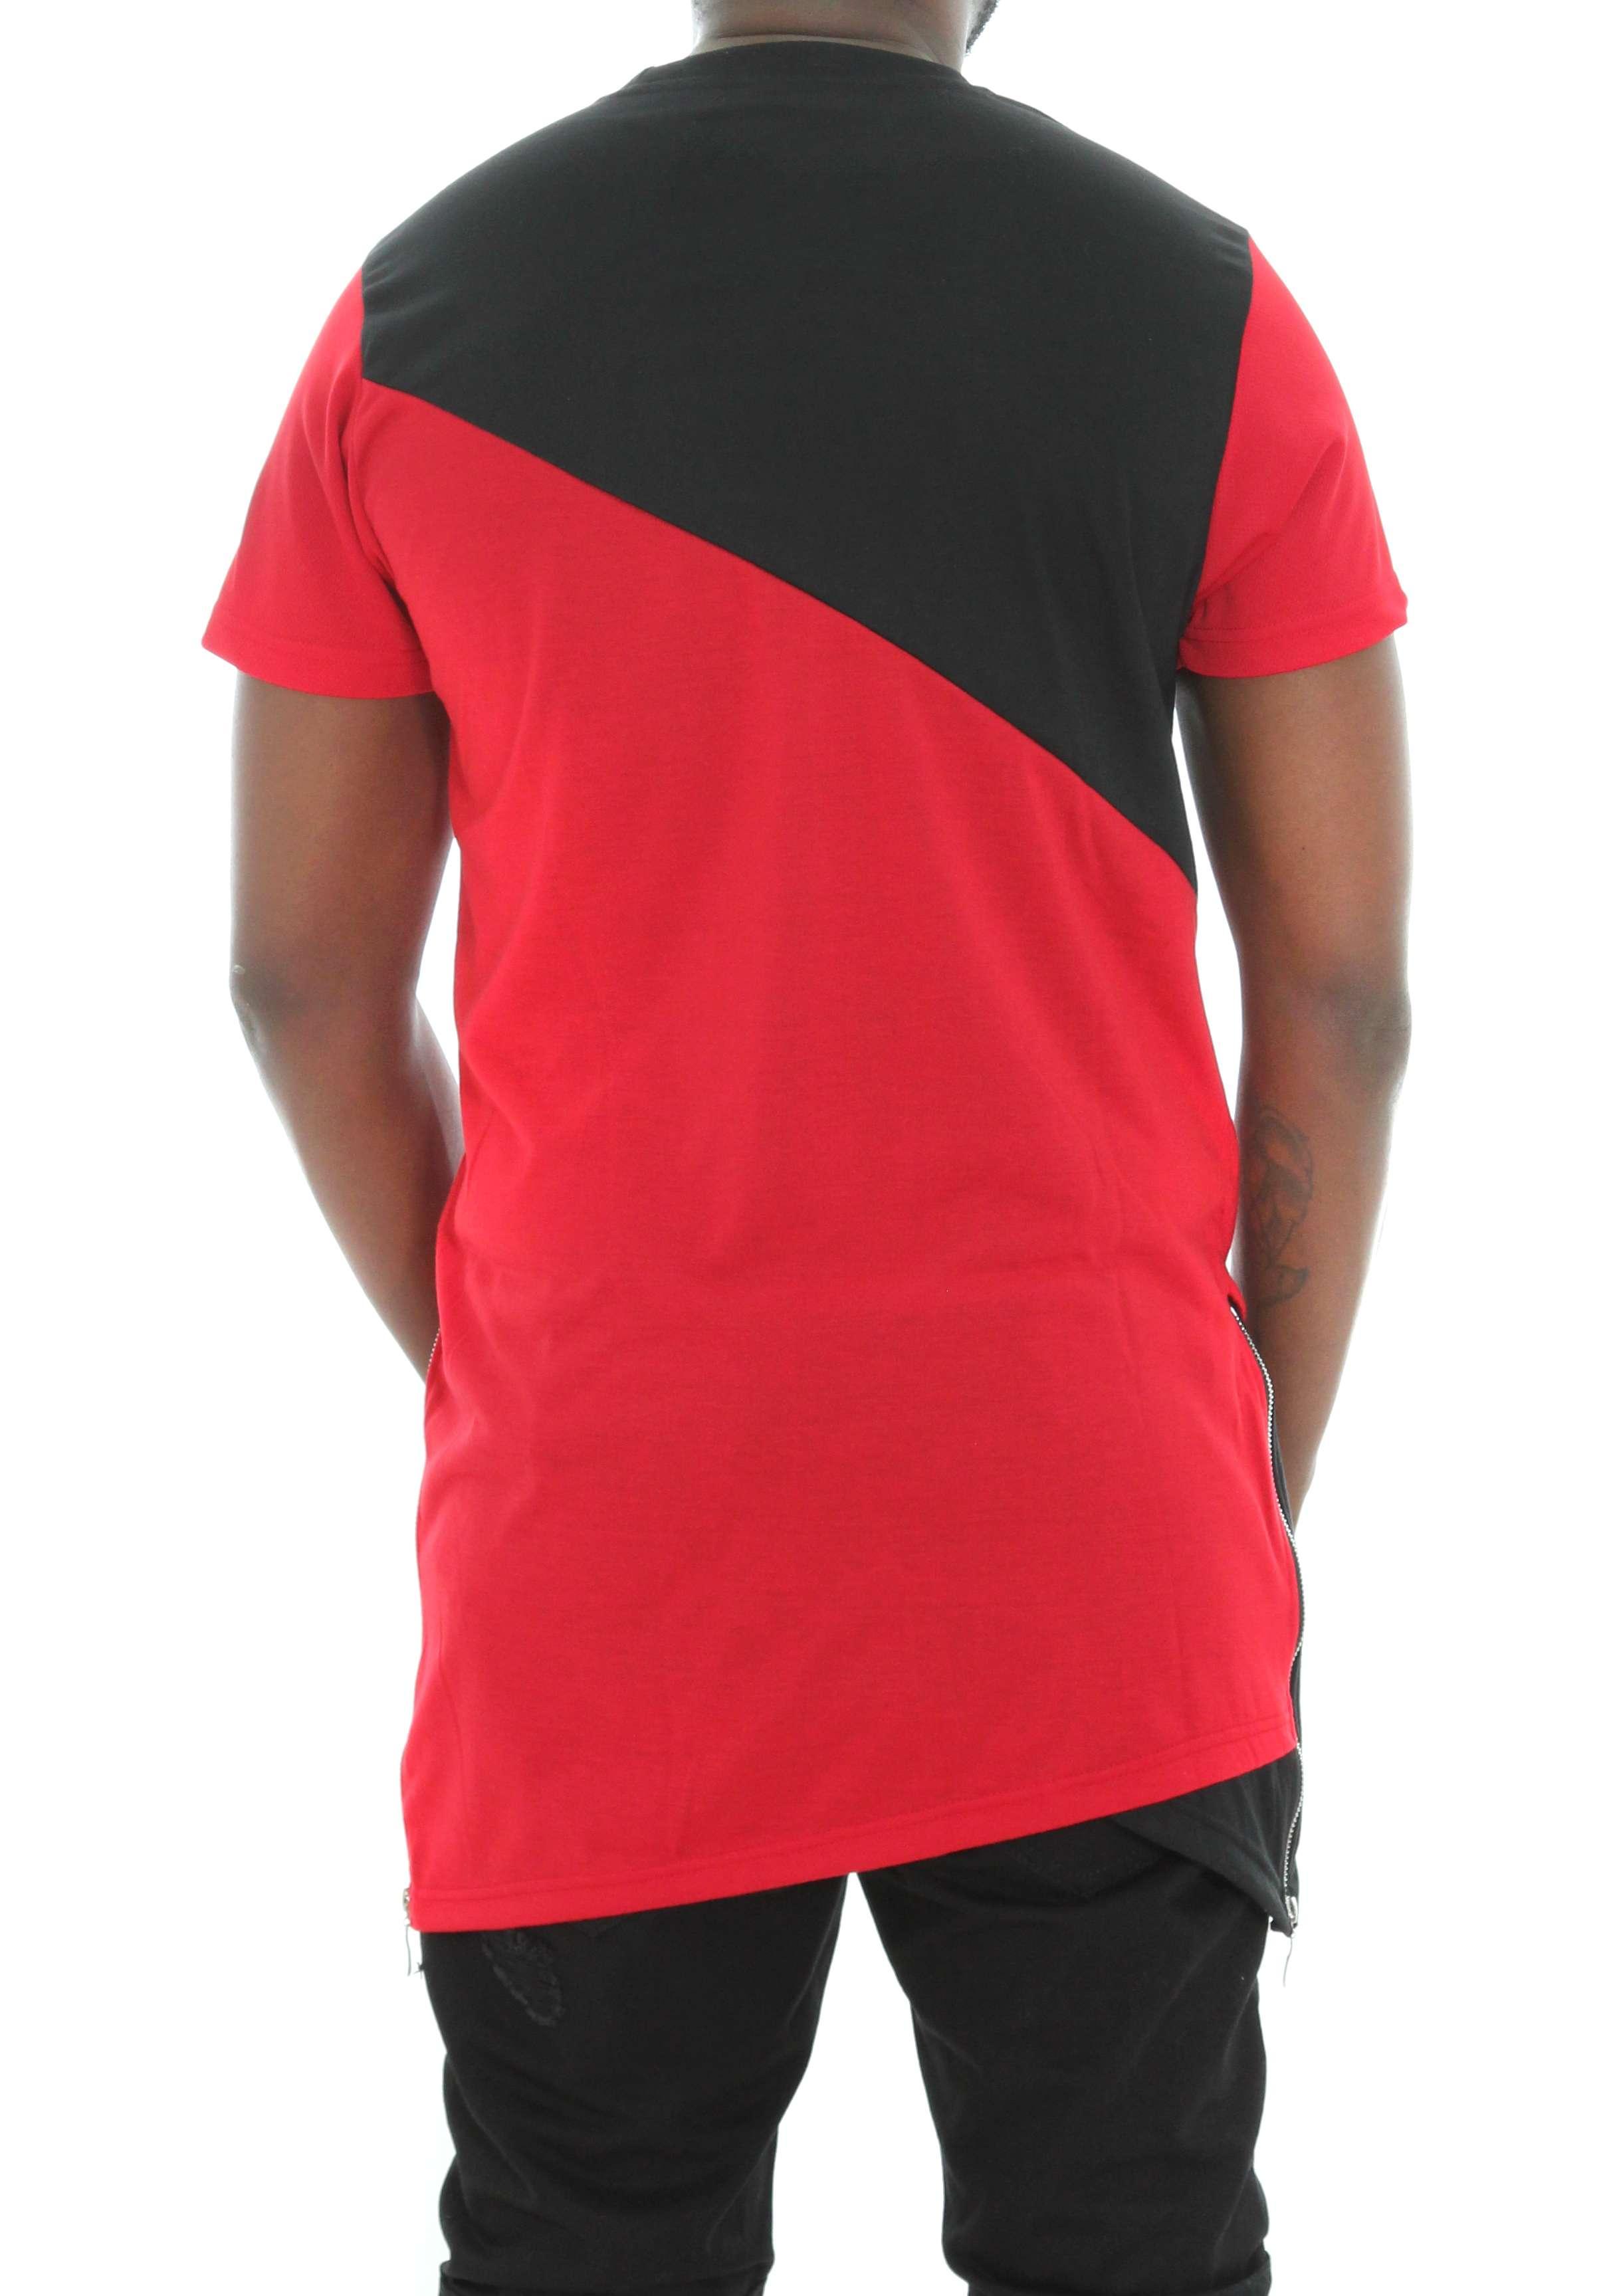 Imperious-Men-039-s-Colorblock-Asymmetric-Hem-Side-Zipper-Longline-T-Shirt thumbnail 12